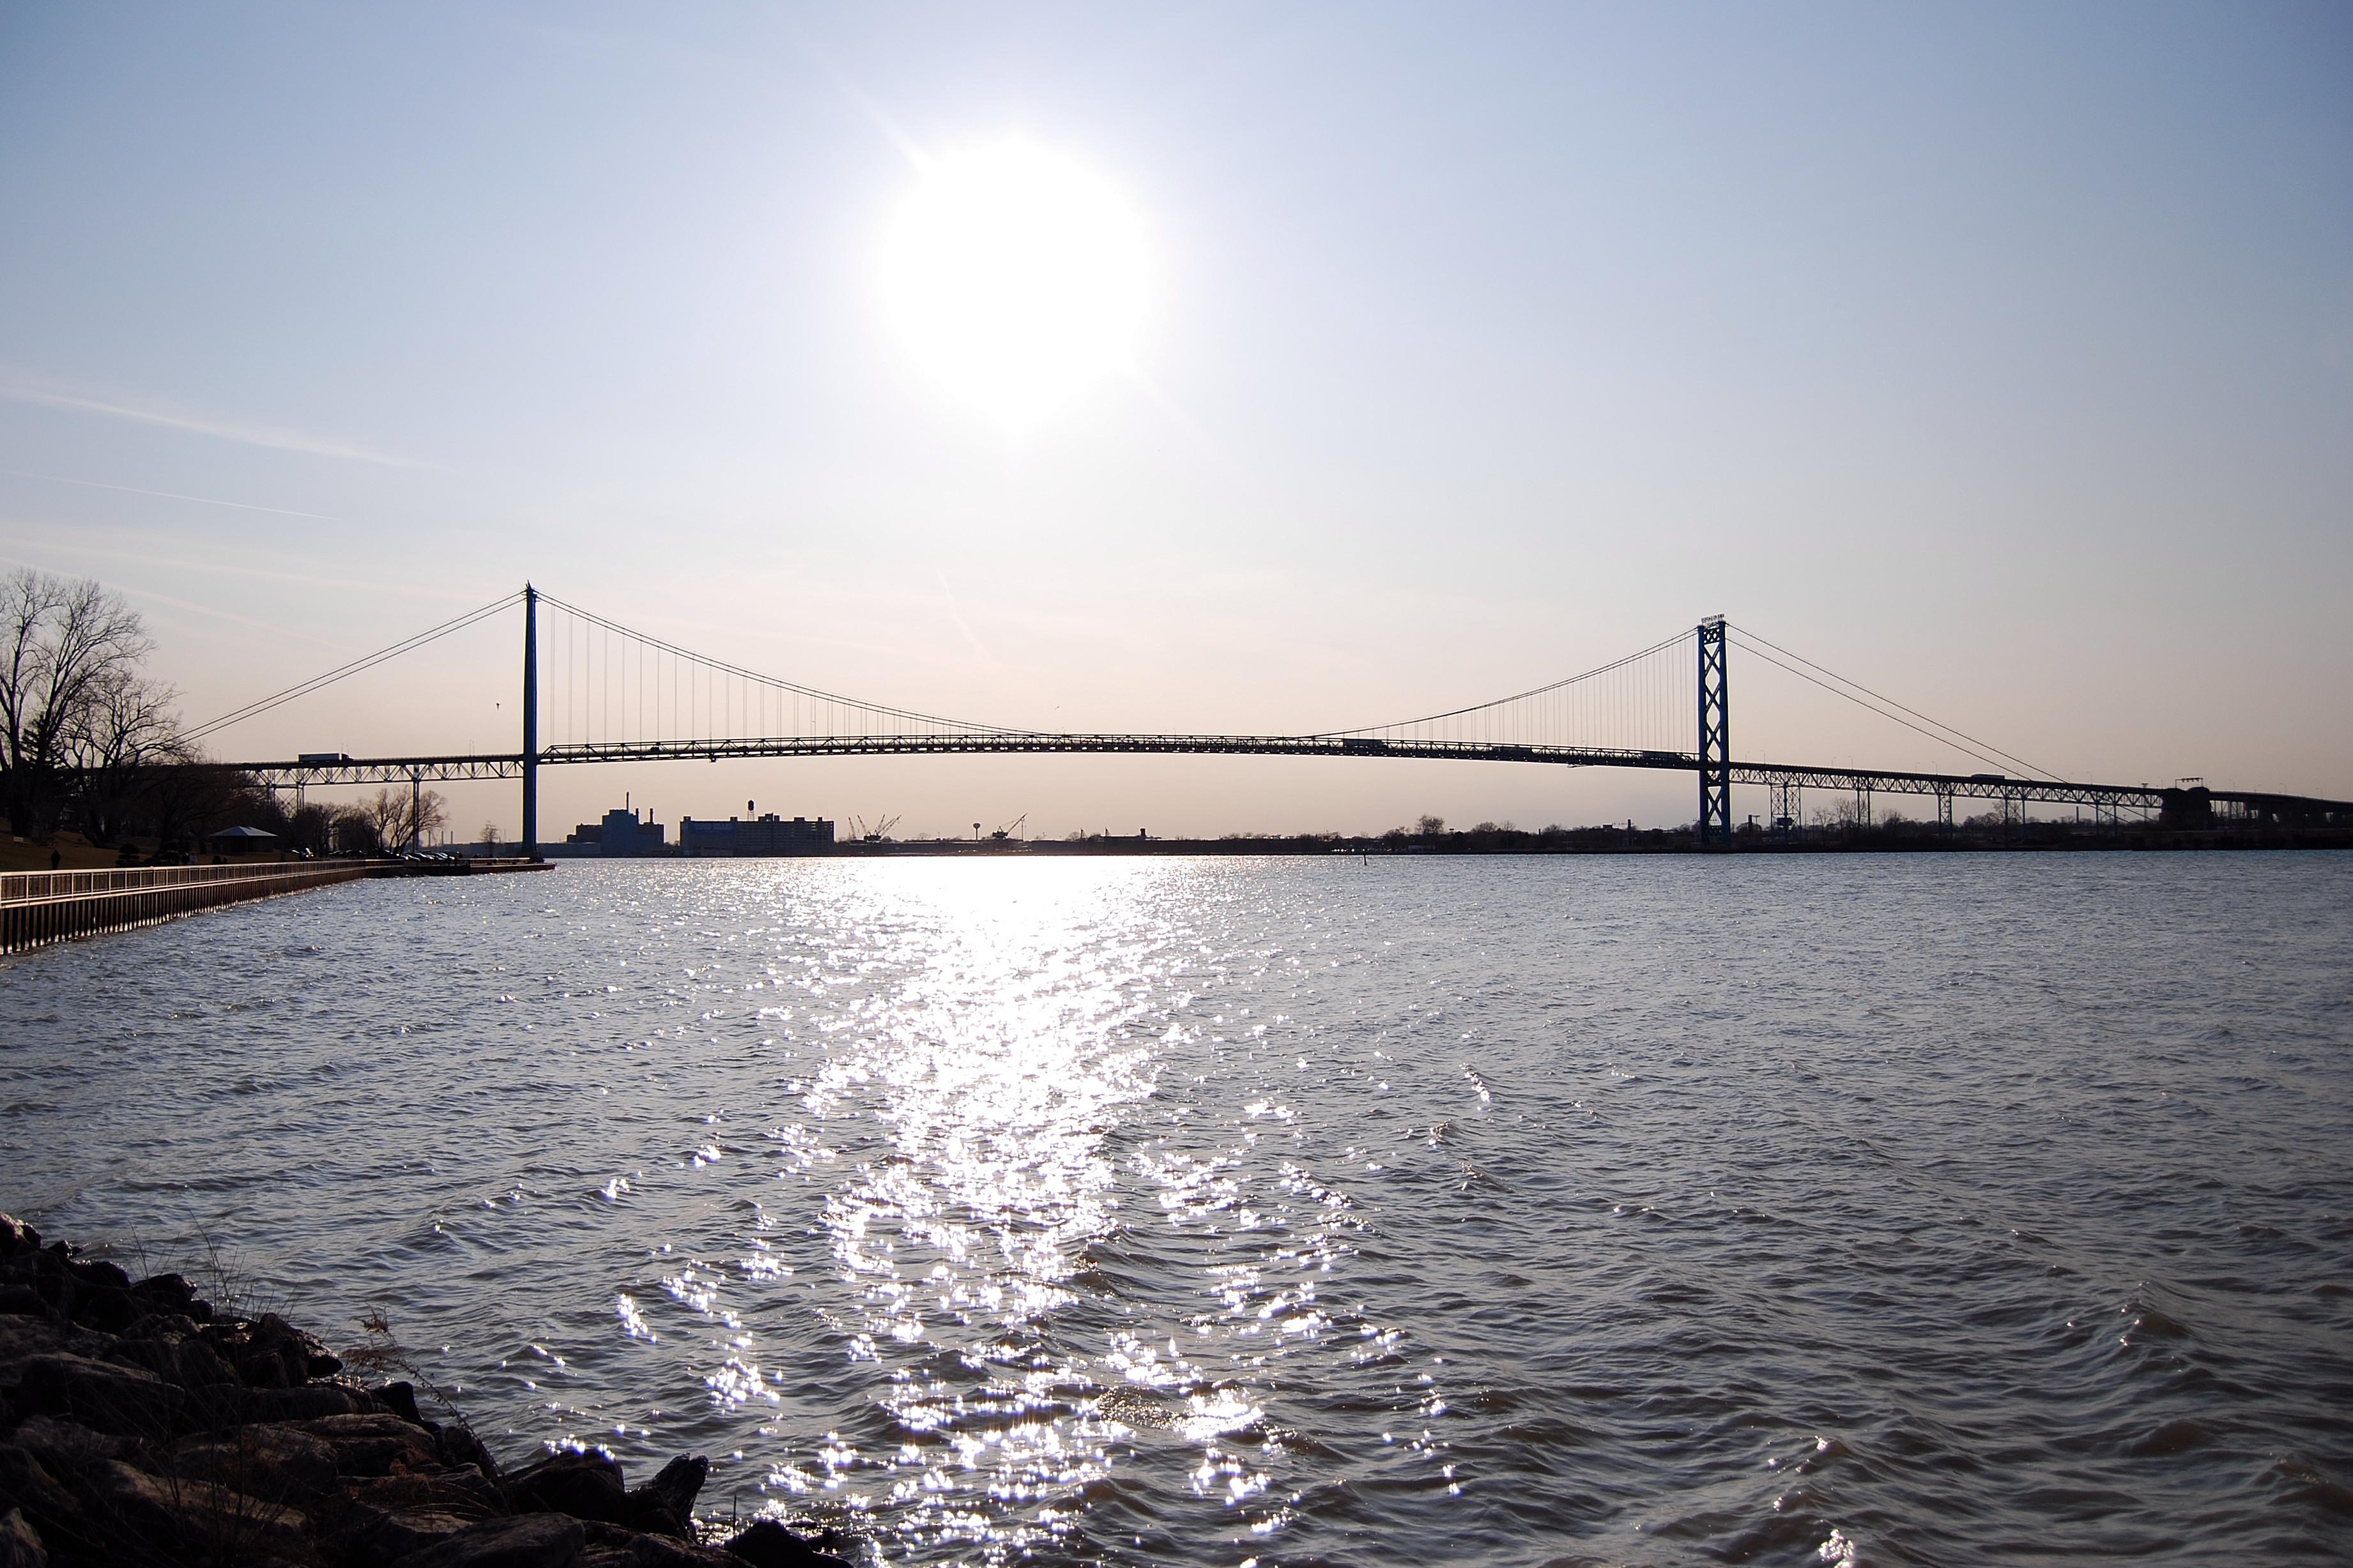 Ambassador Bridge connects Windsor and Detroit